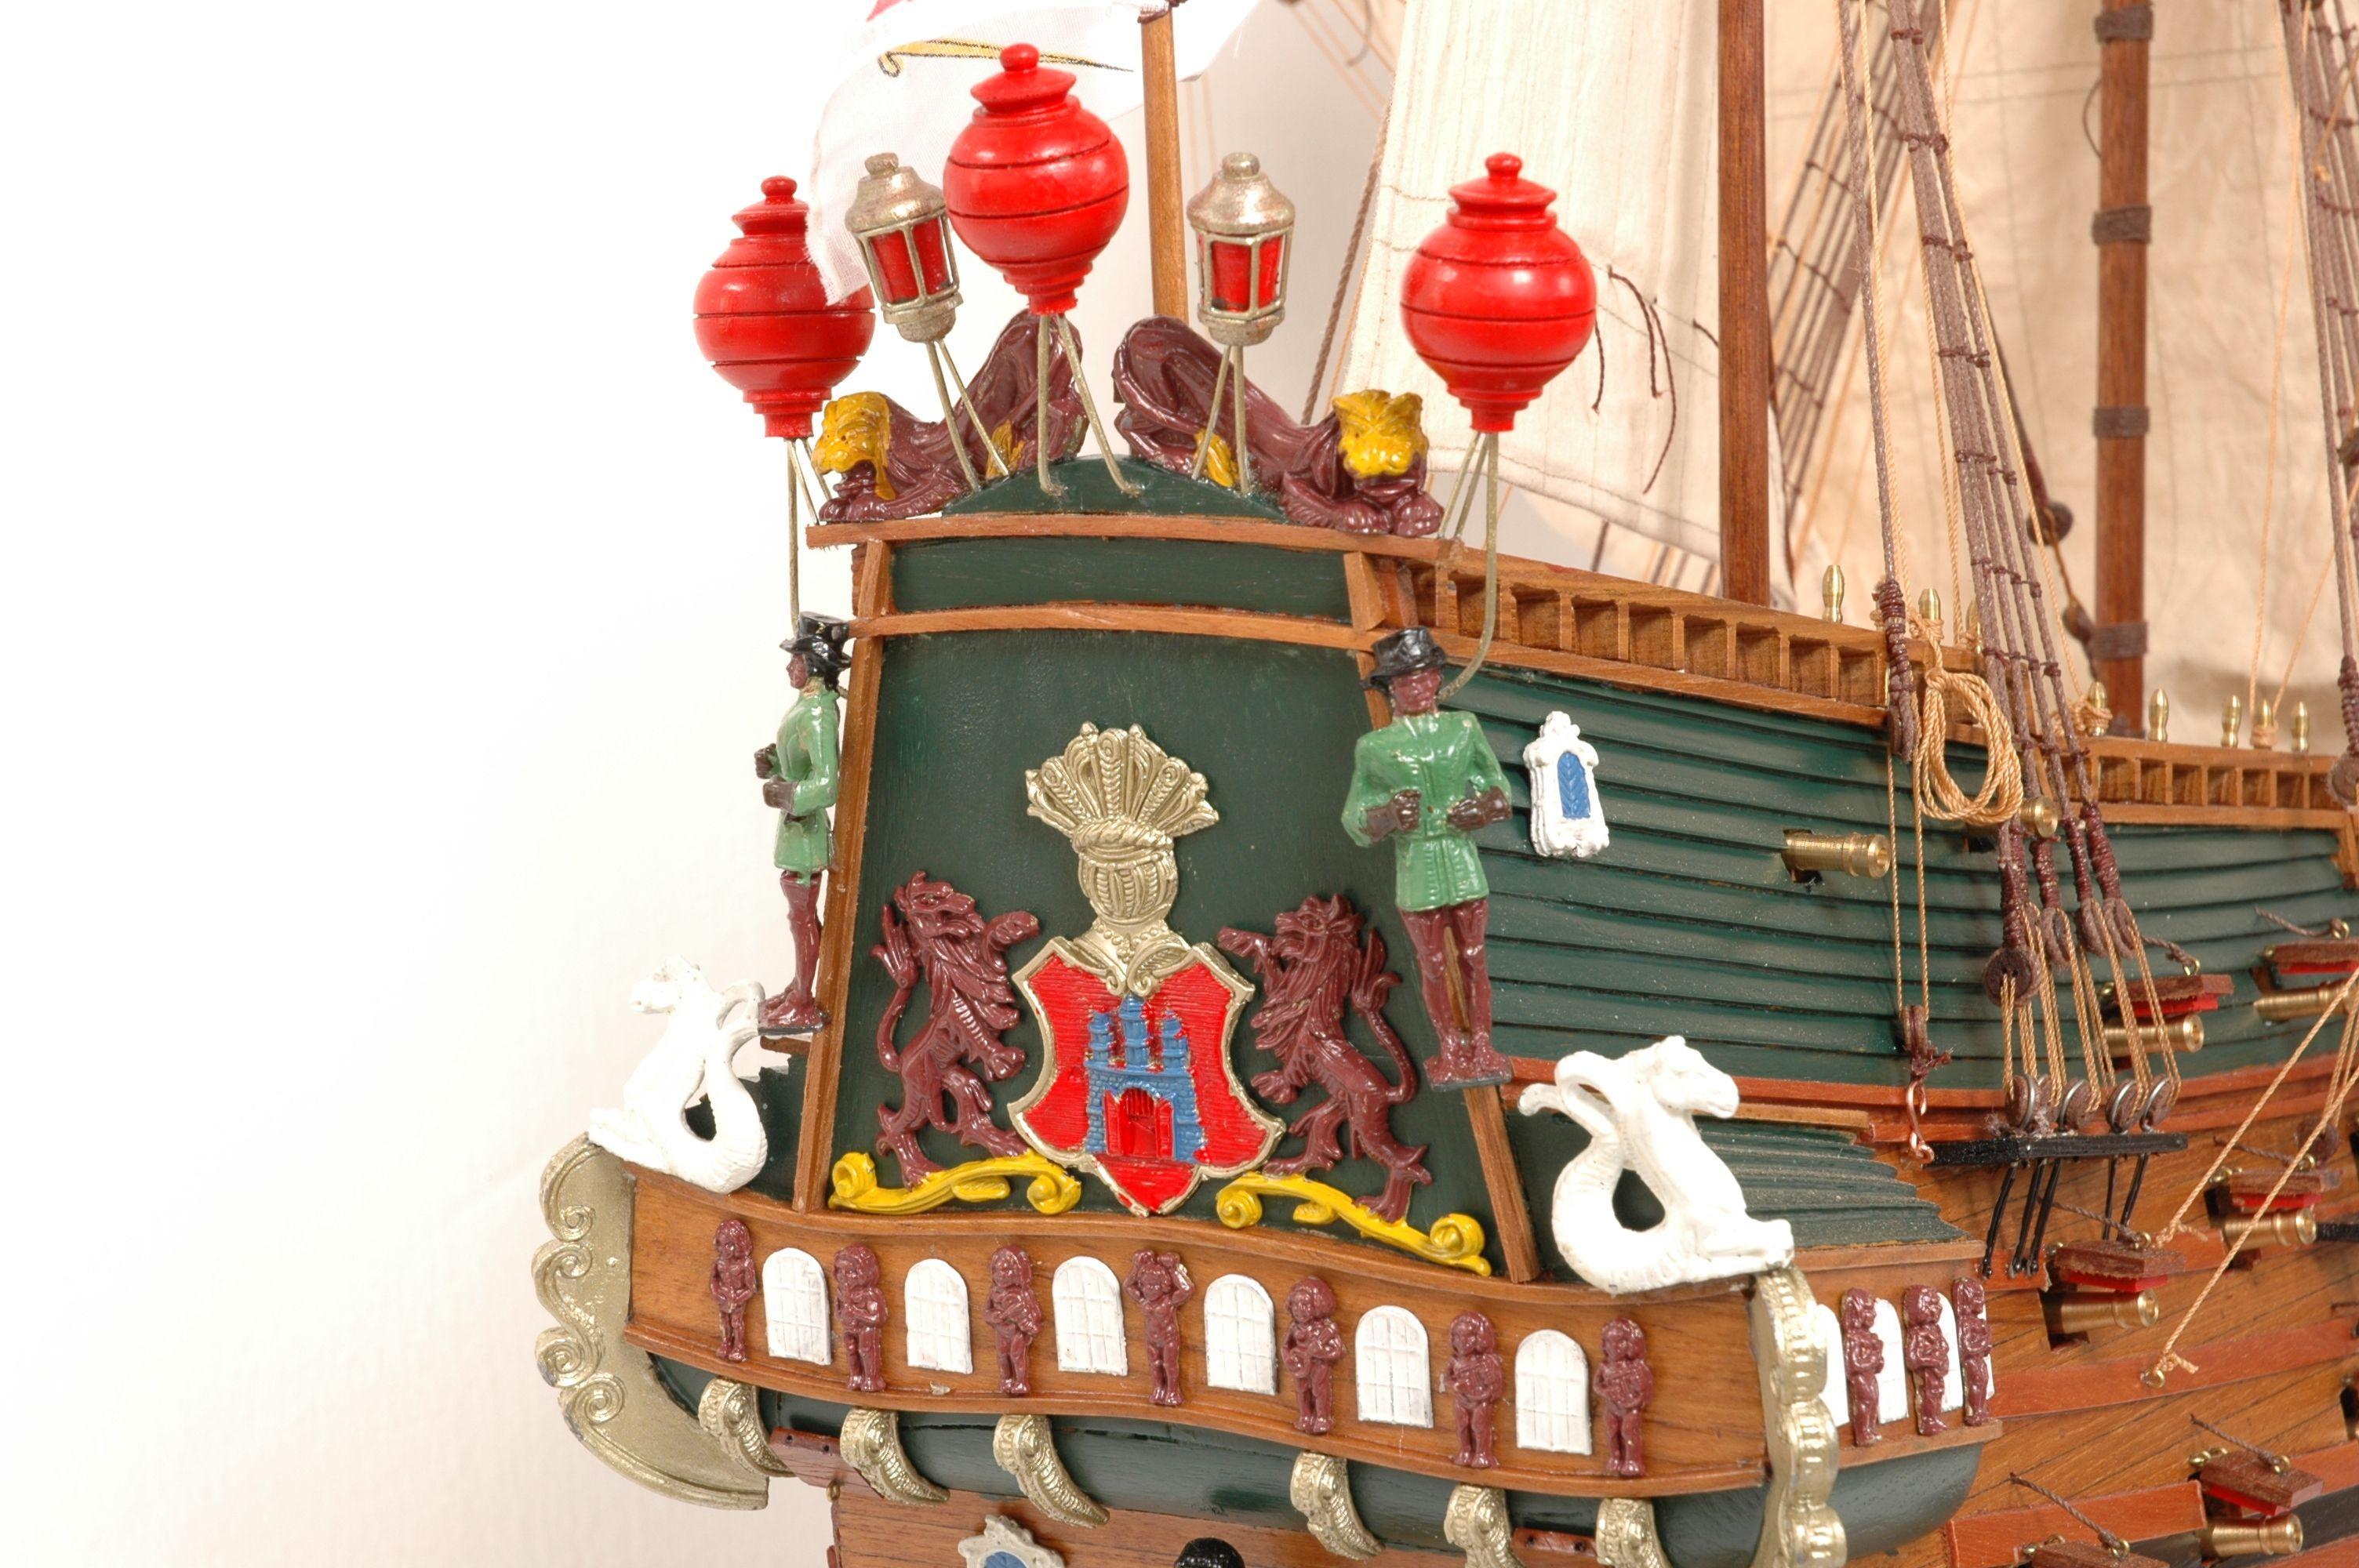 152-8211-Wappen-von-Hamburg-Ship-Model-Superior-Range